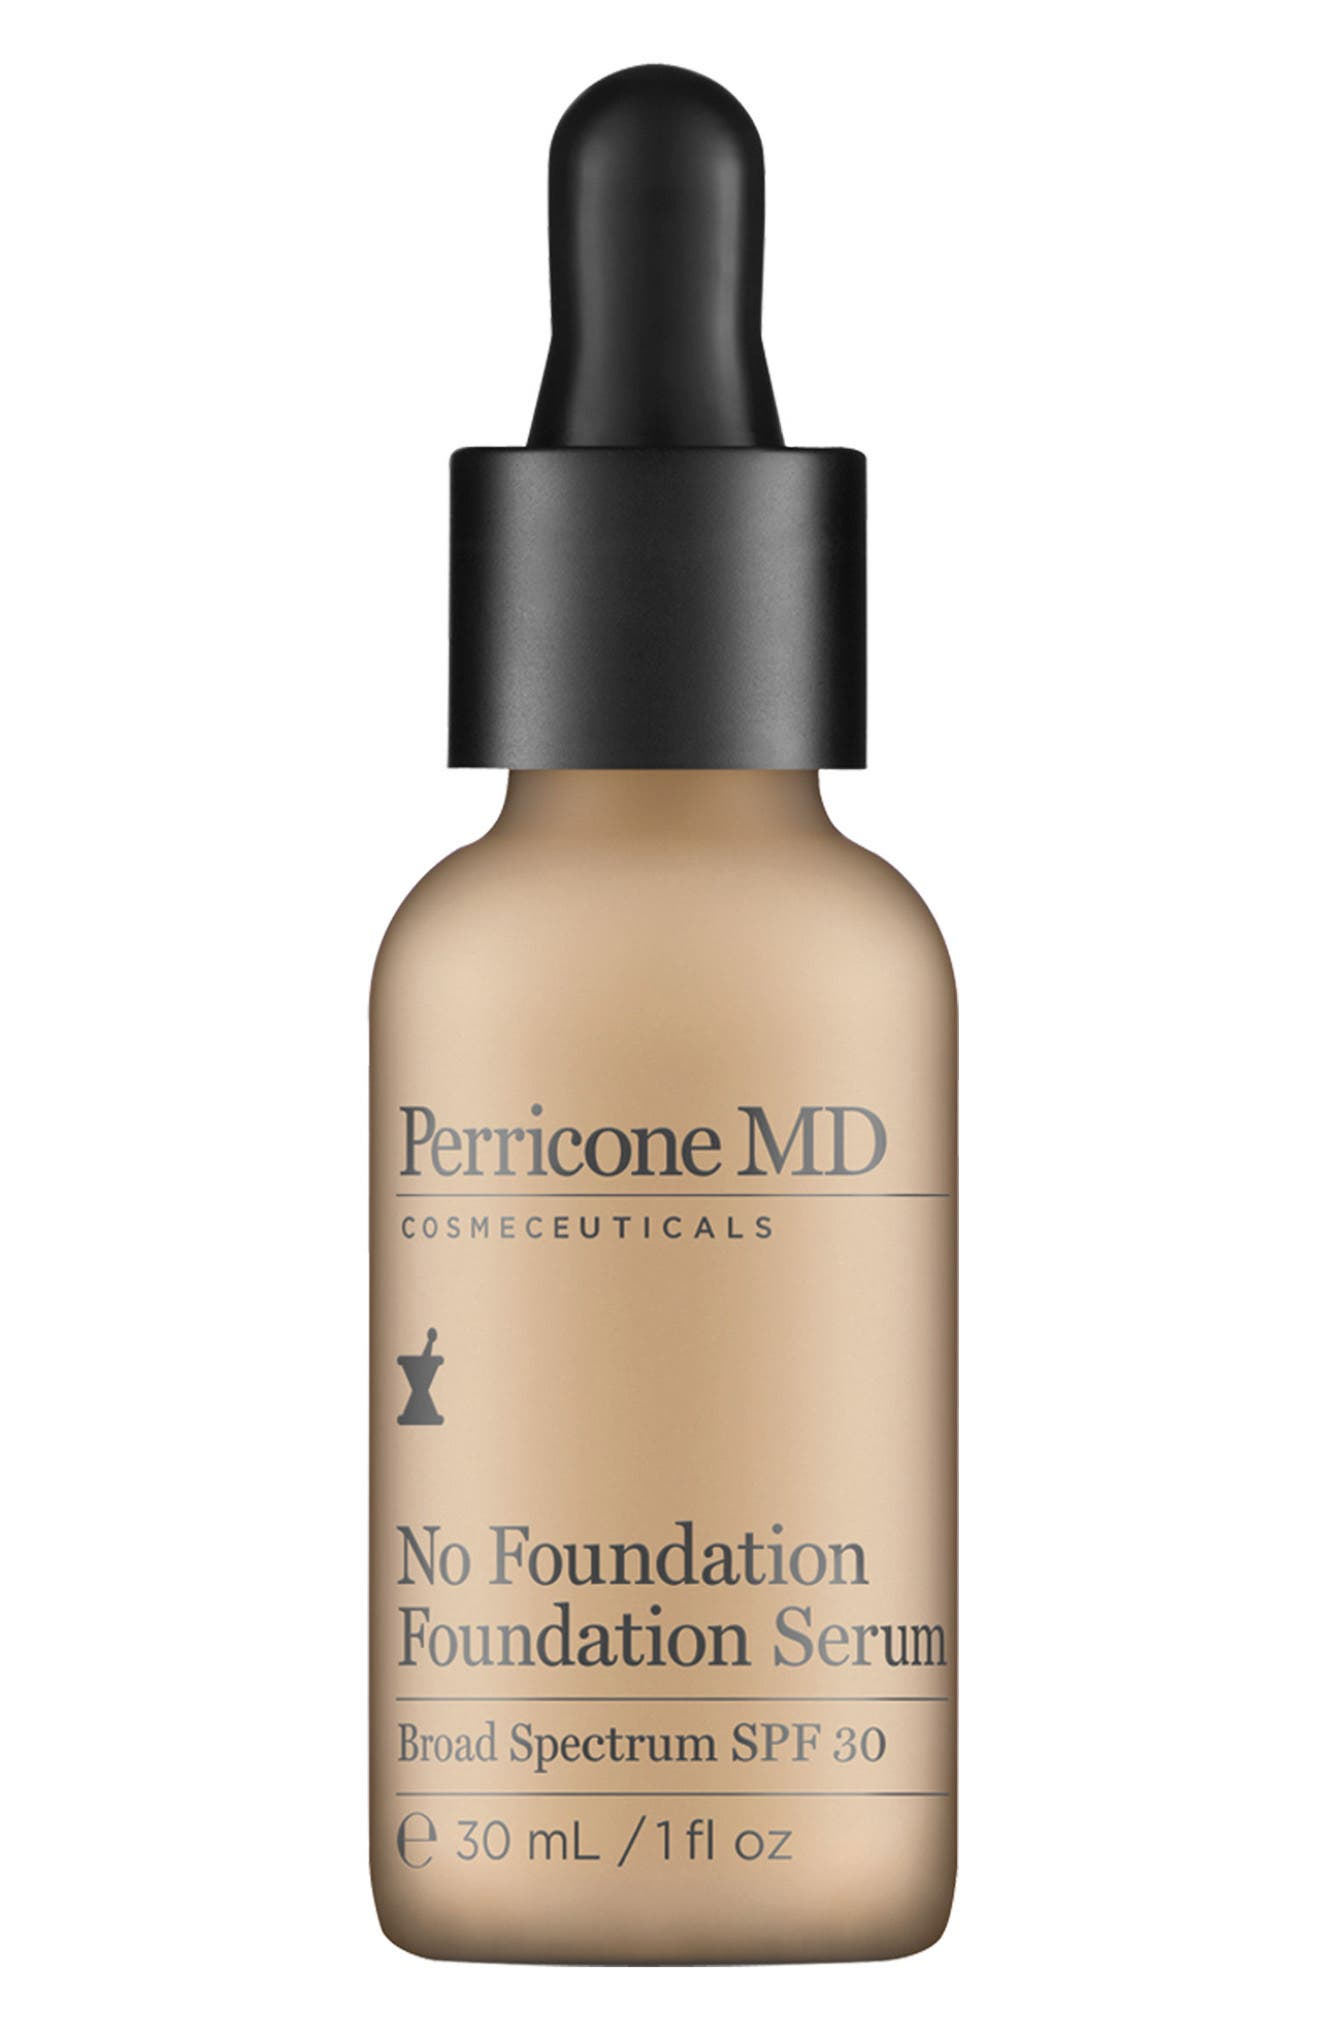 Perricone MD 'No Foundation' Foundation Serum Broad Spectrum SPF 30